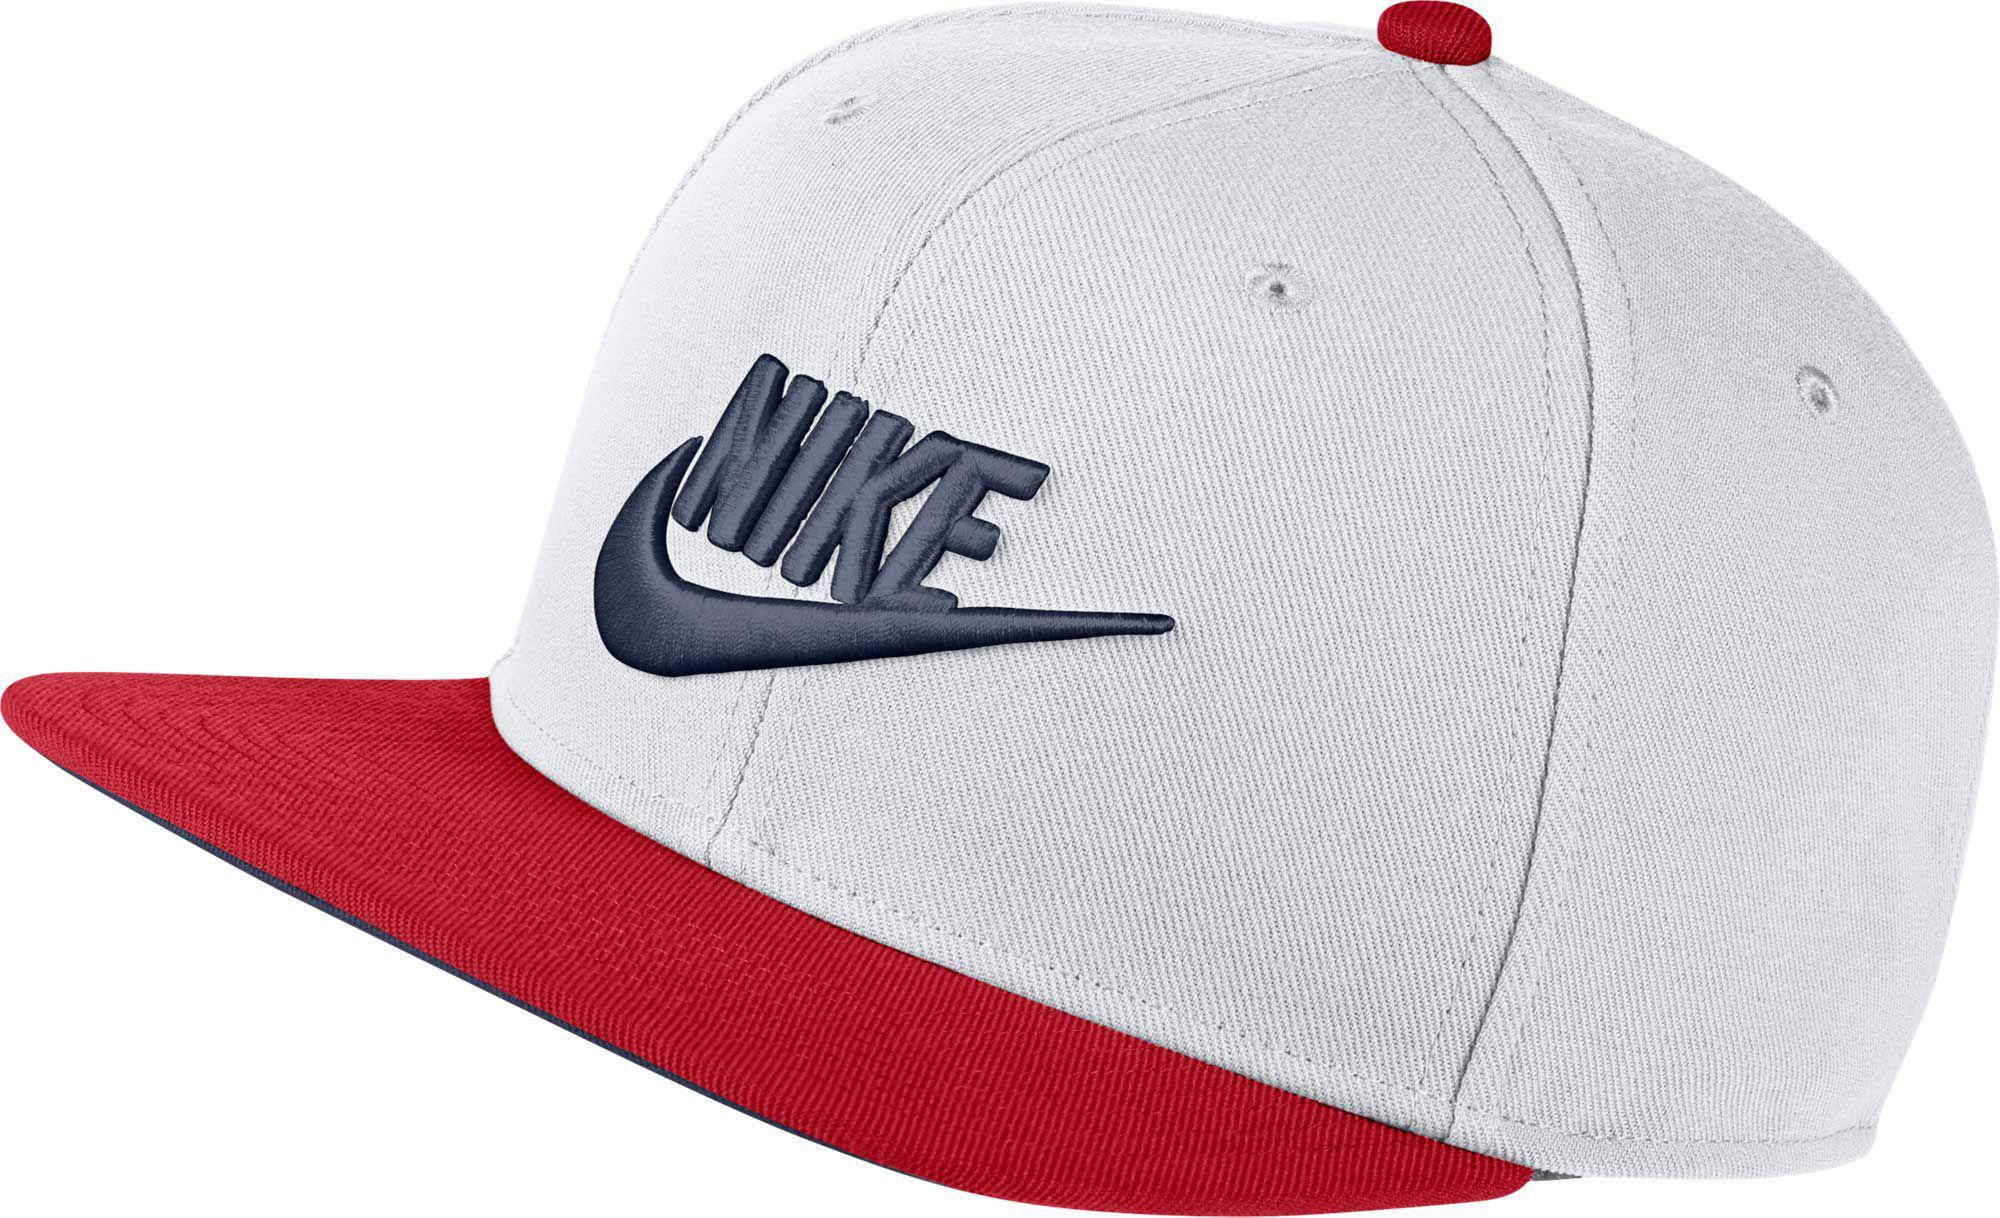 3e69c7ccd48 Lyst - Nike Sportswear Futura Pro Adjustable Hat in White for Men